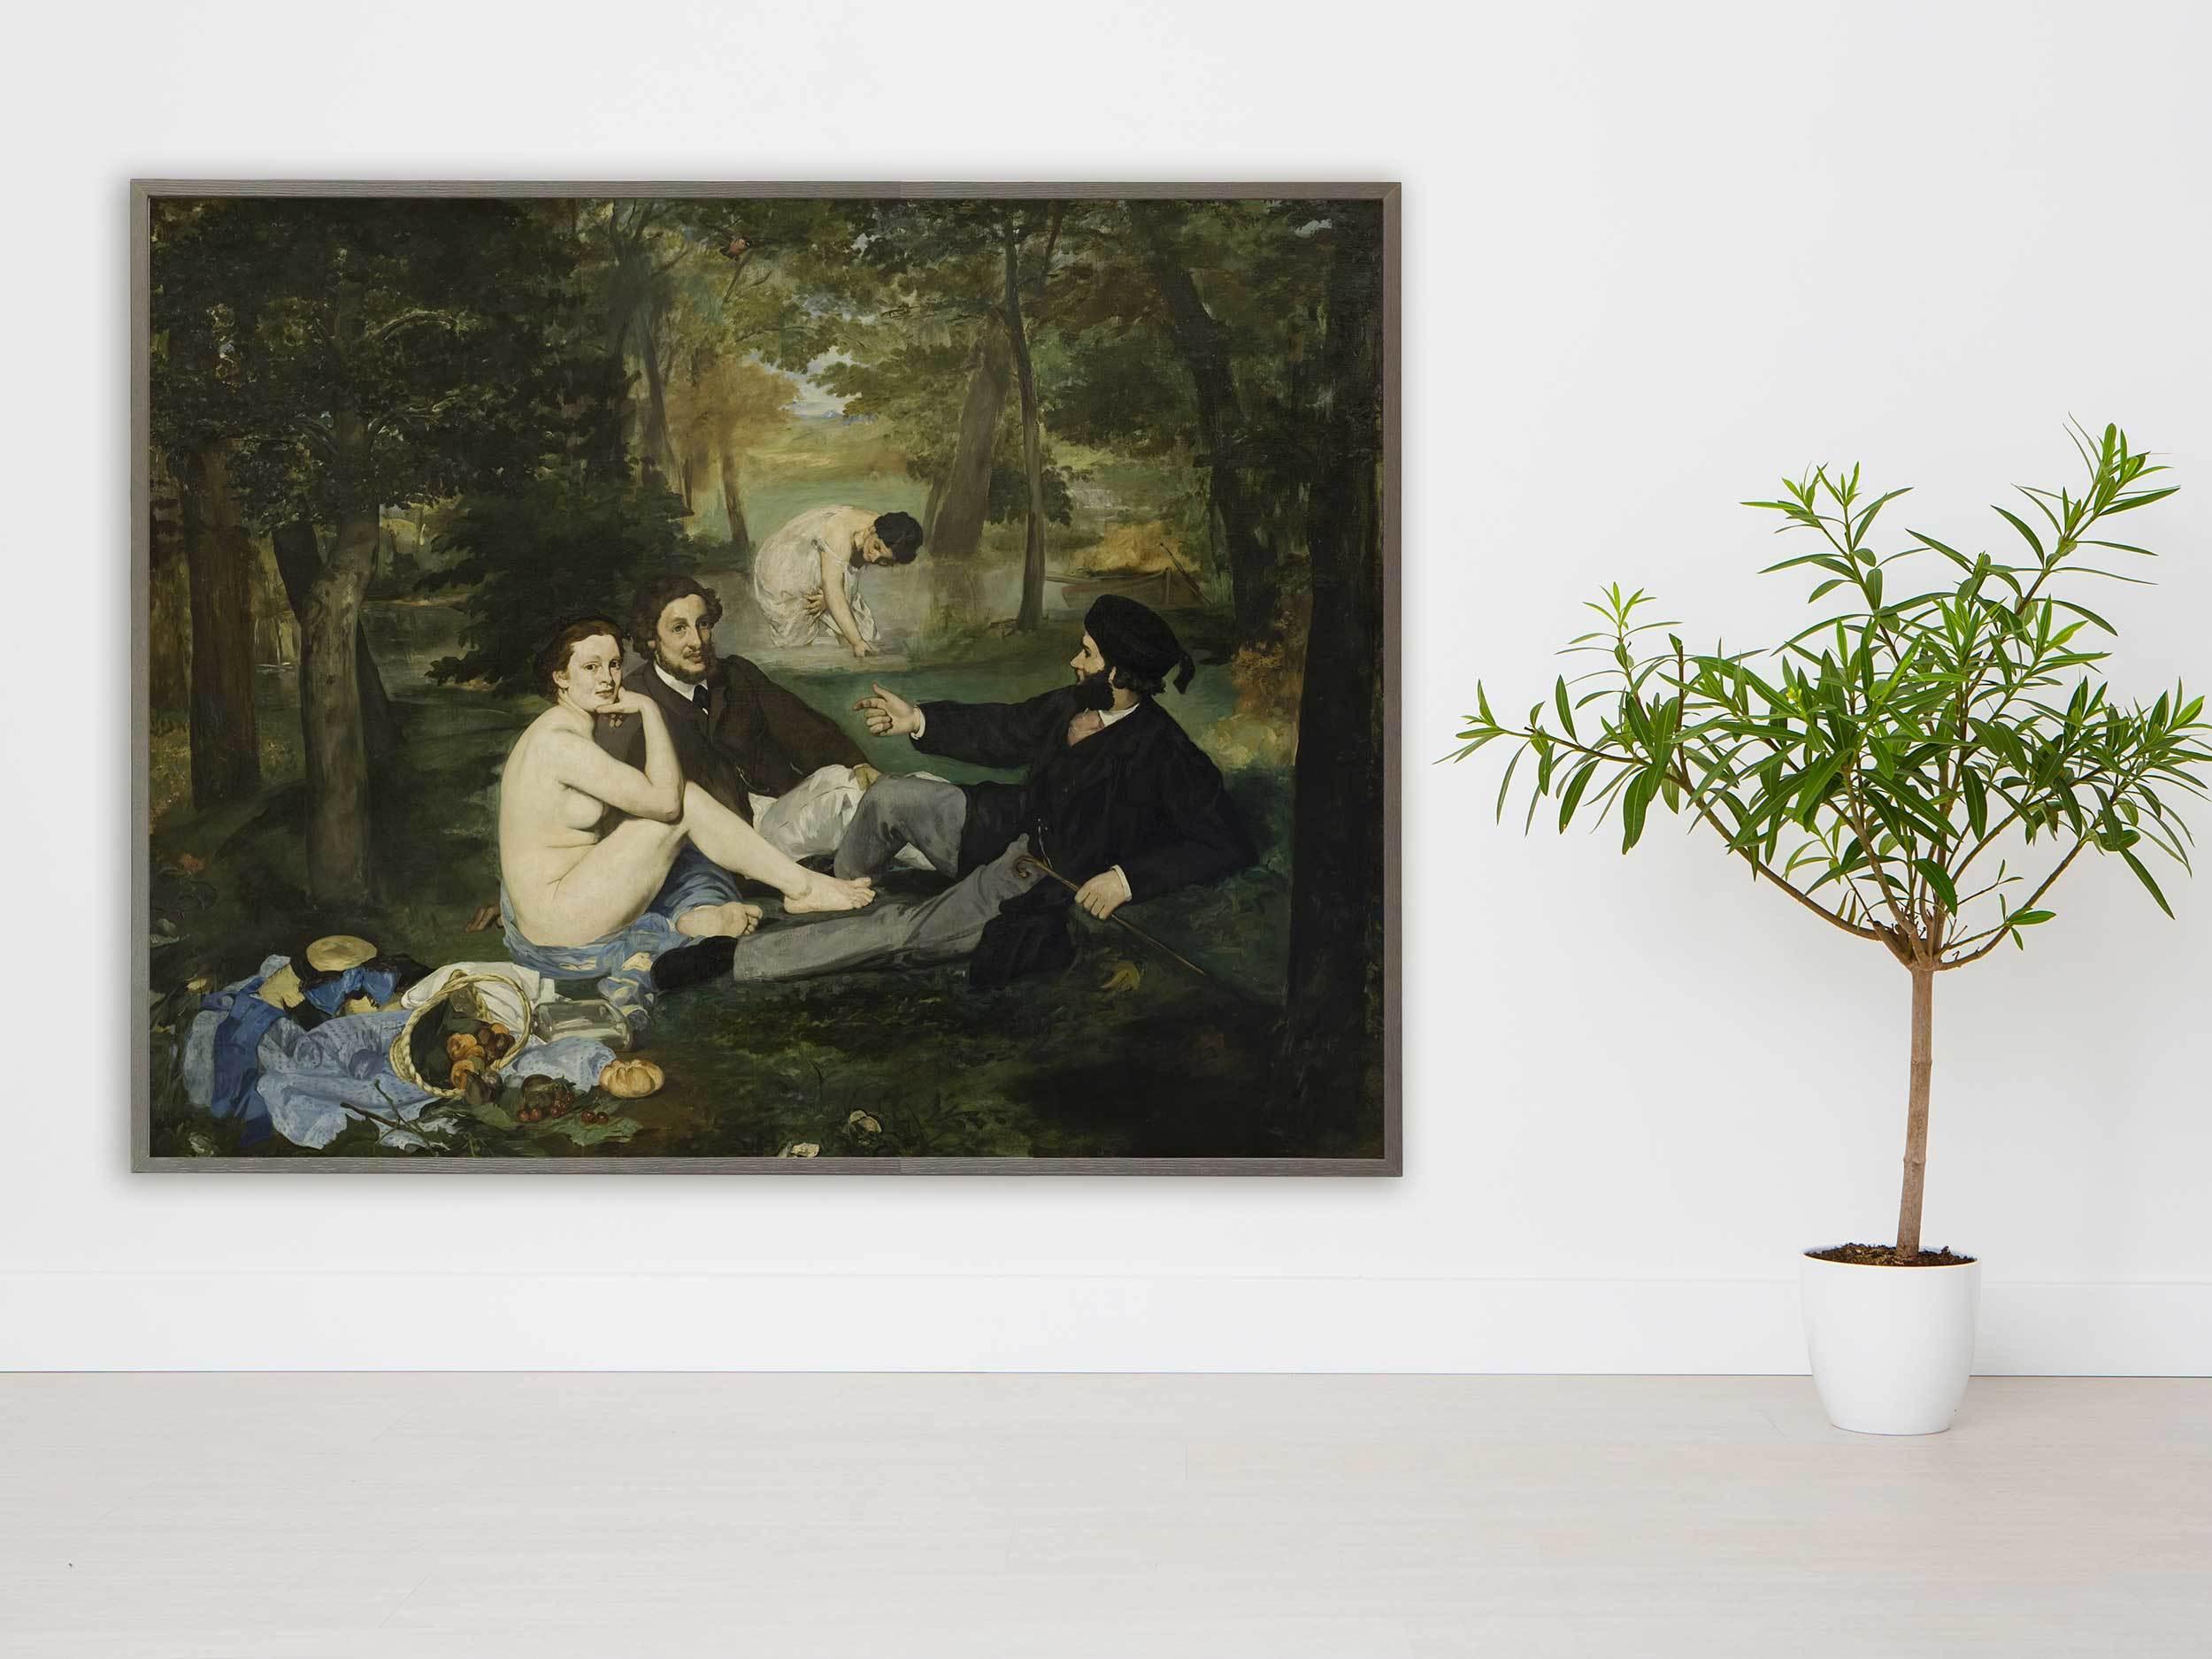 Edouard Manet - Luncheon on the Grass, 1863, Bilderrahmen grau